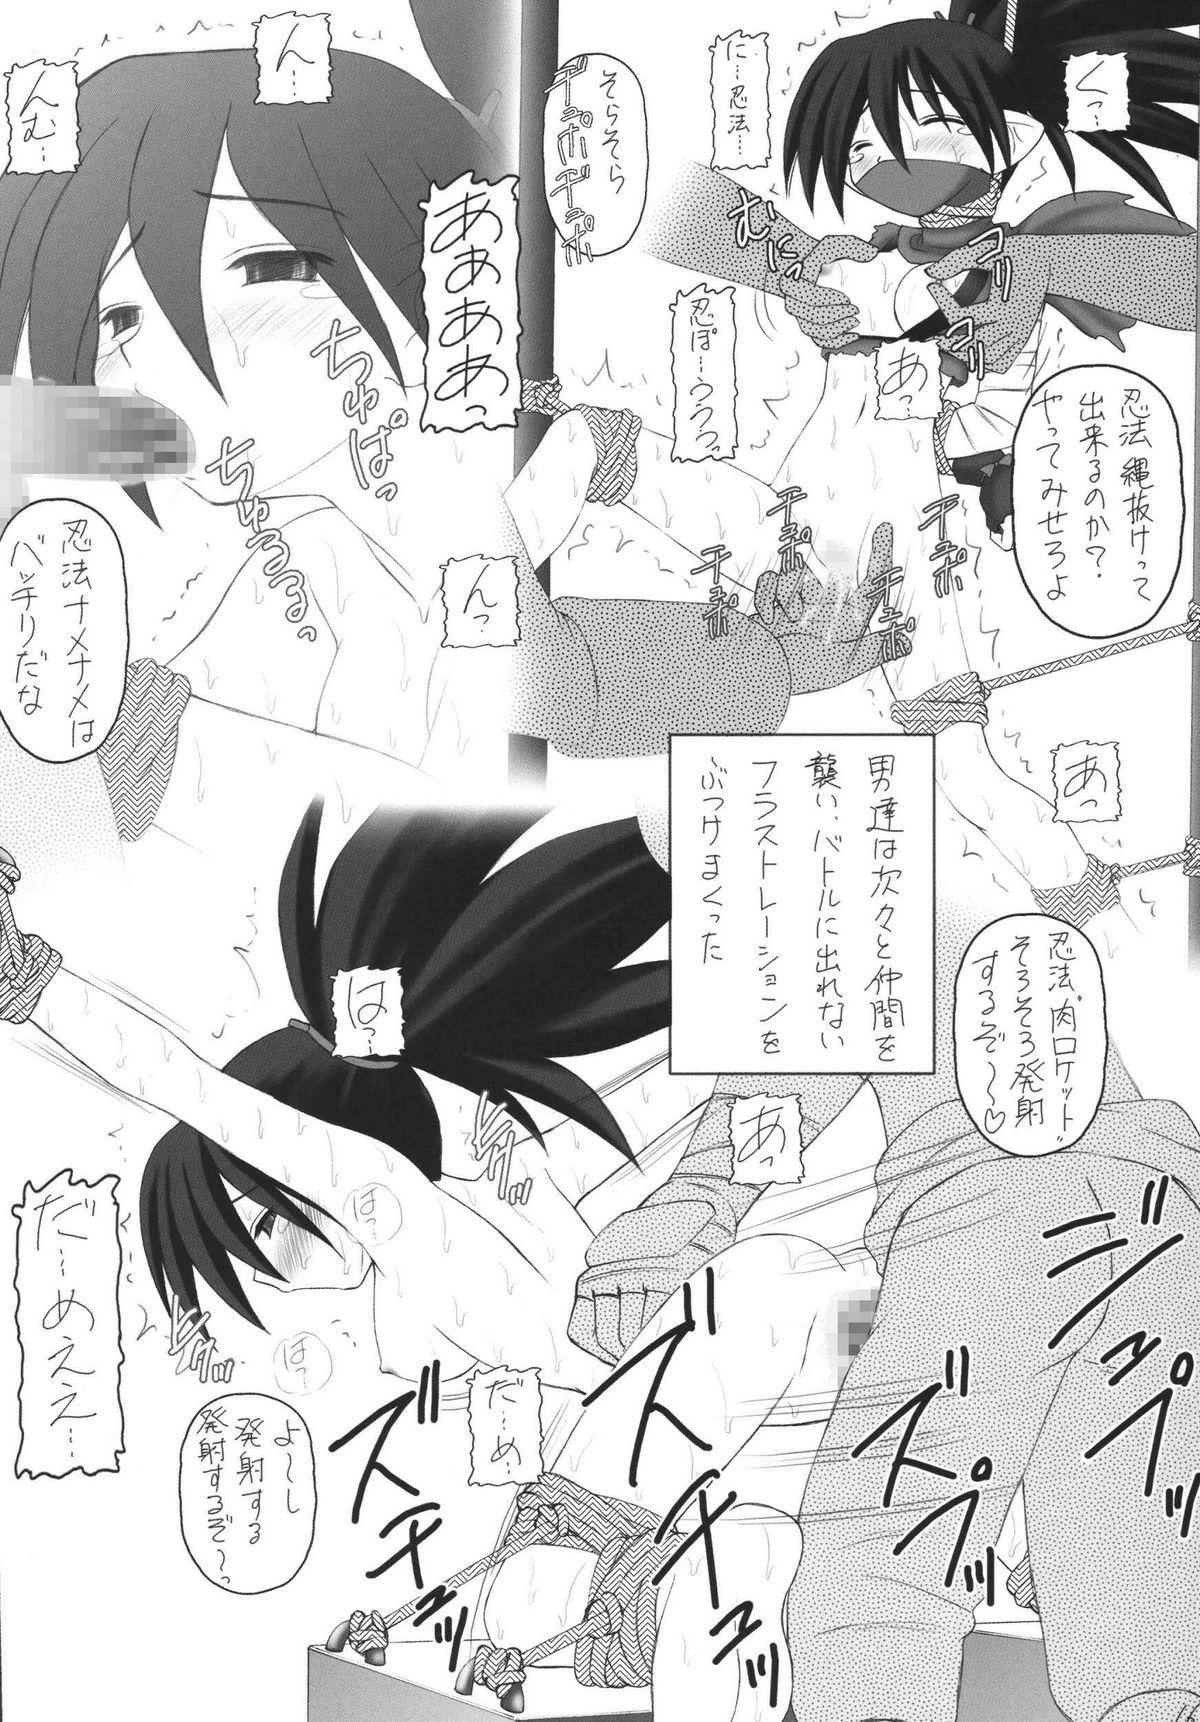 Kanimiso Vol. 4 - Love Dynamites 14